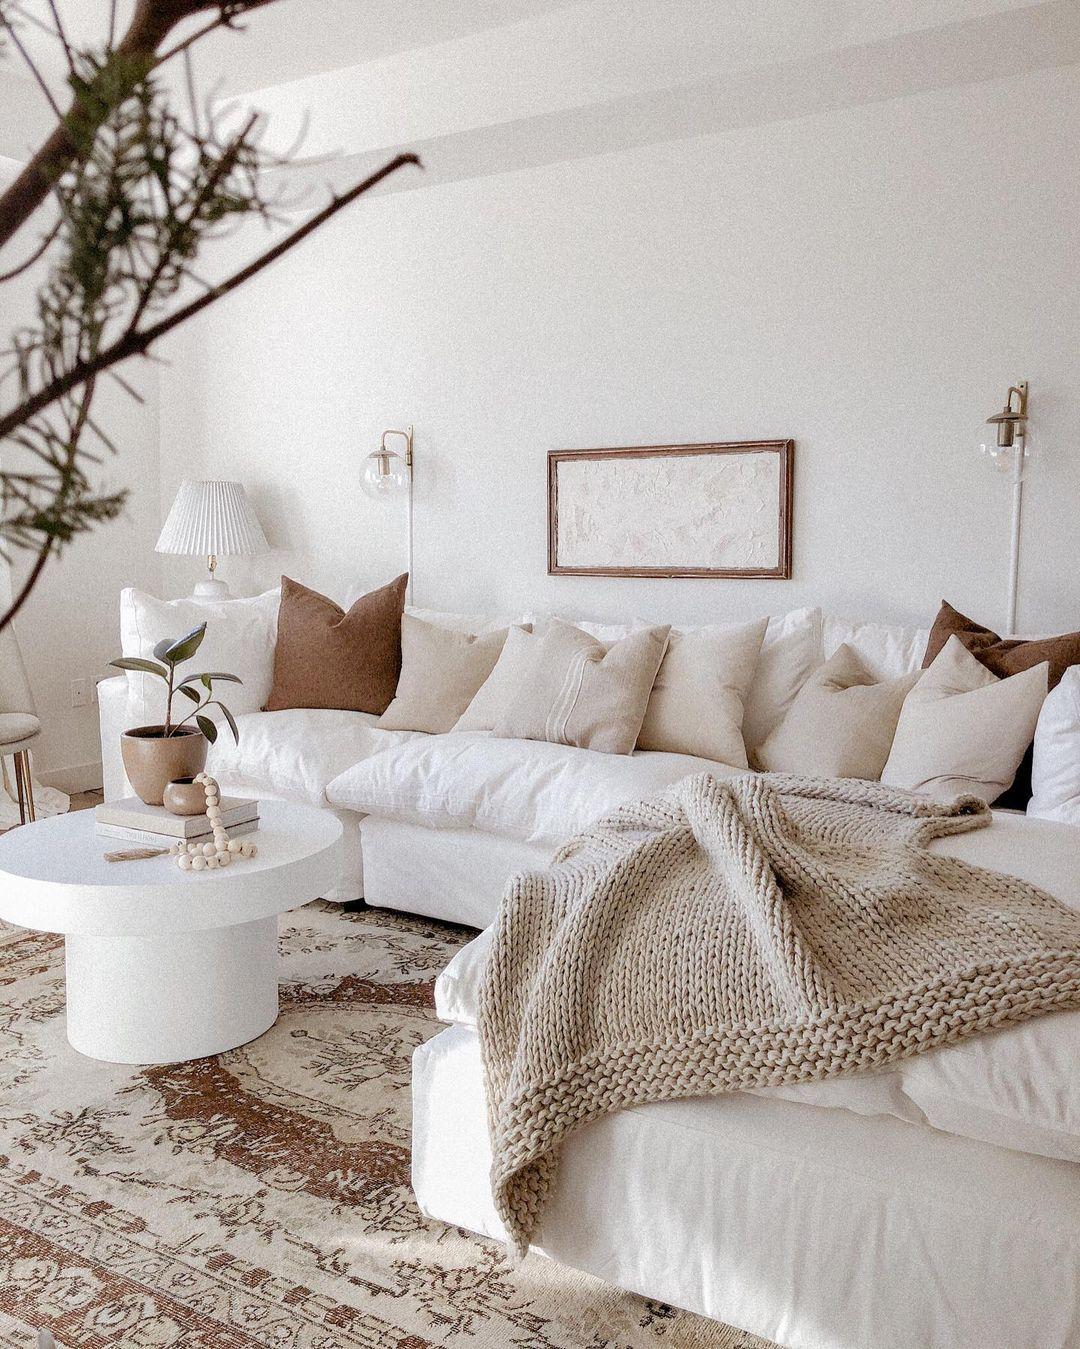 20 Best Interior Designers to Follow on Instagram